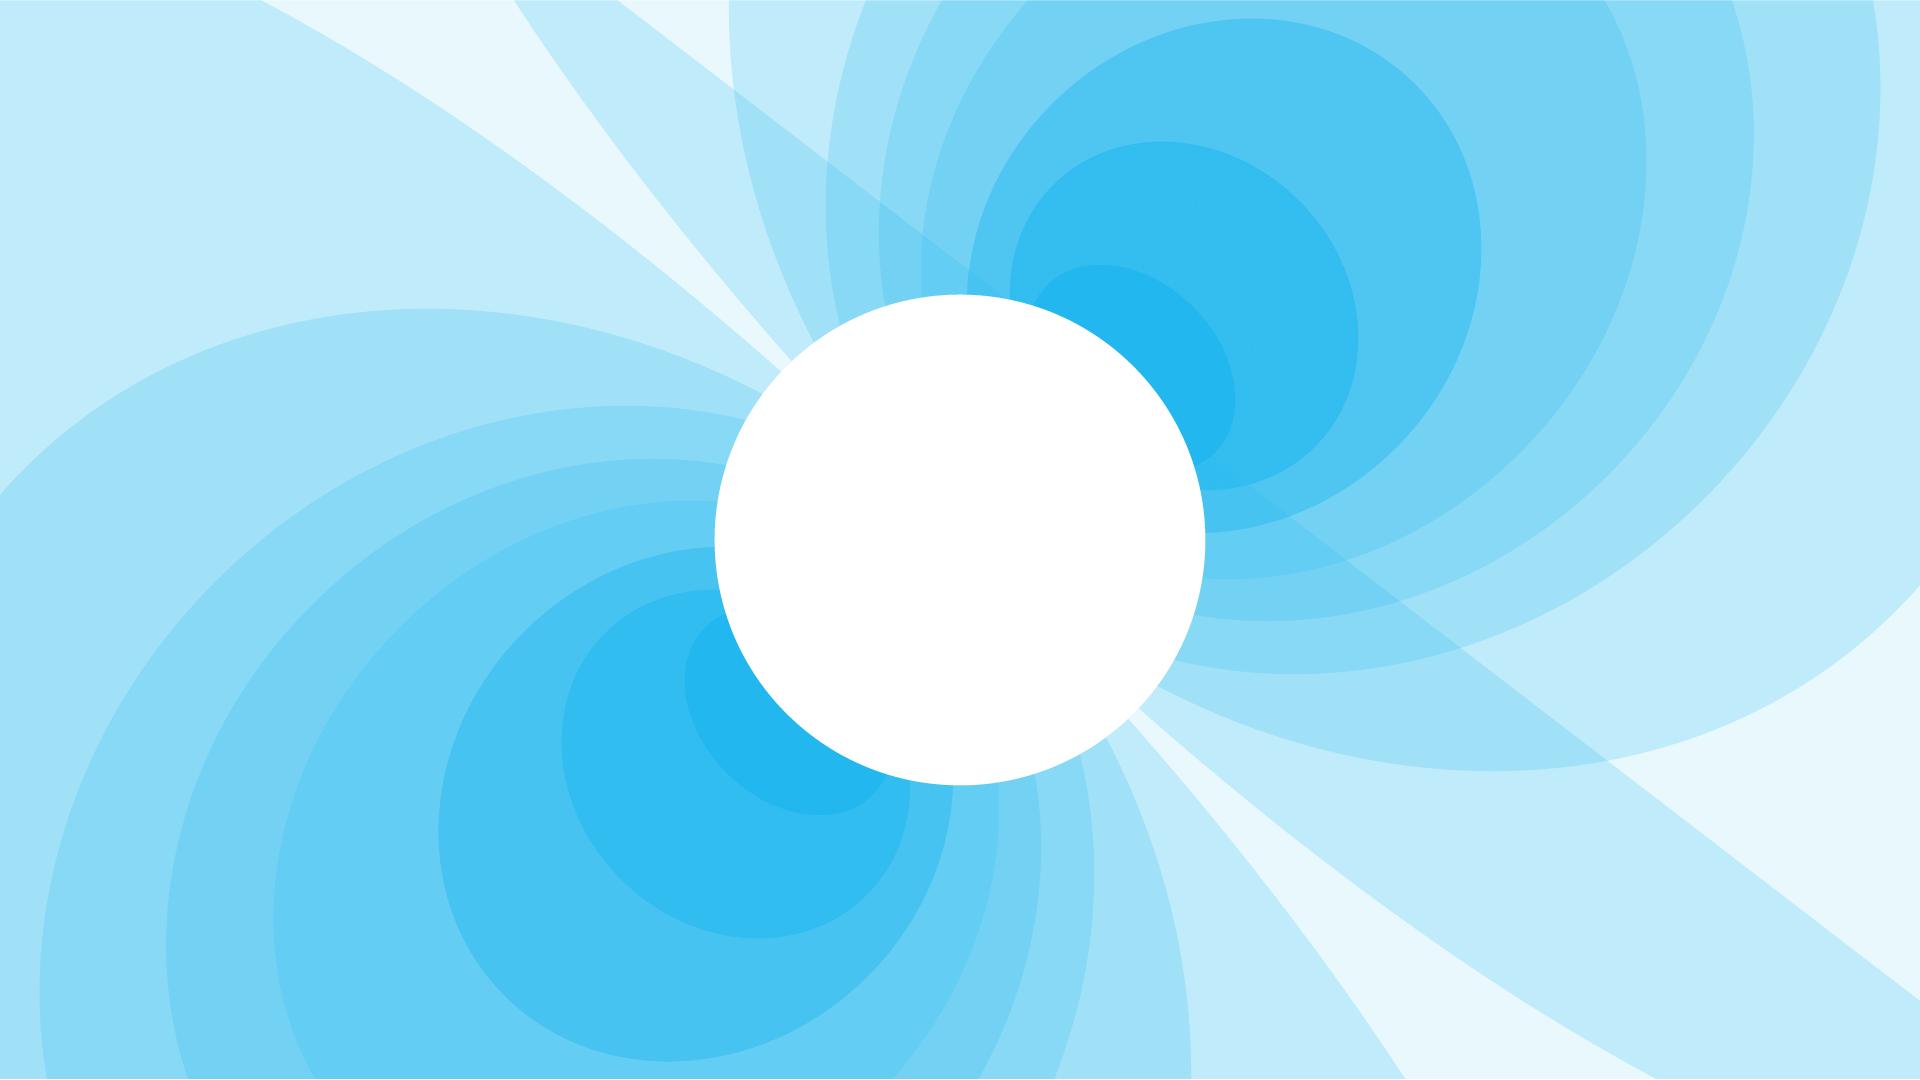 250_Neutron Stars_Kurzgesagt Project Pic 2